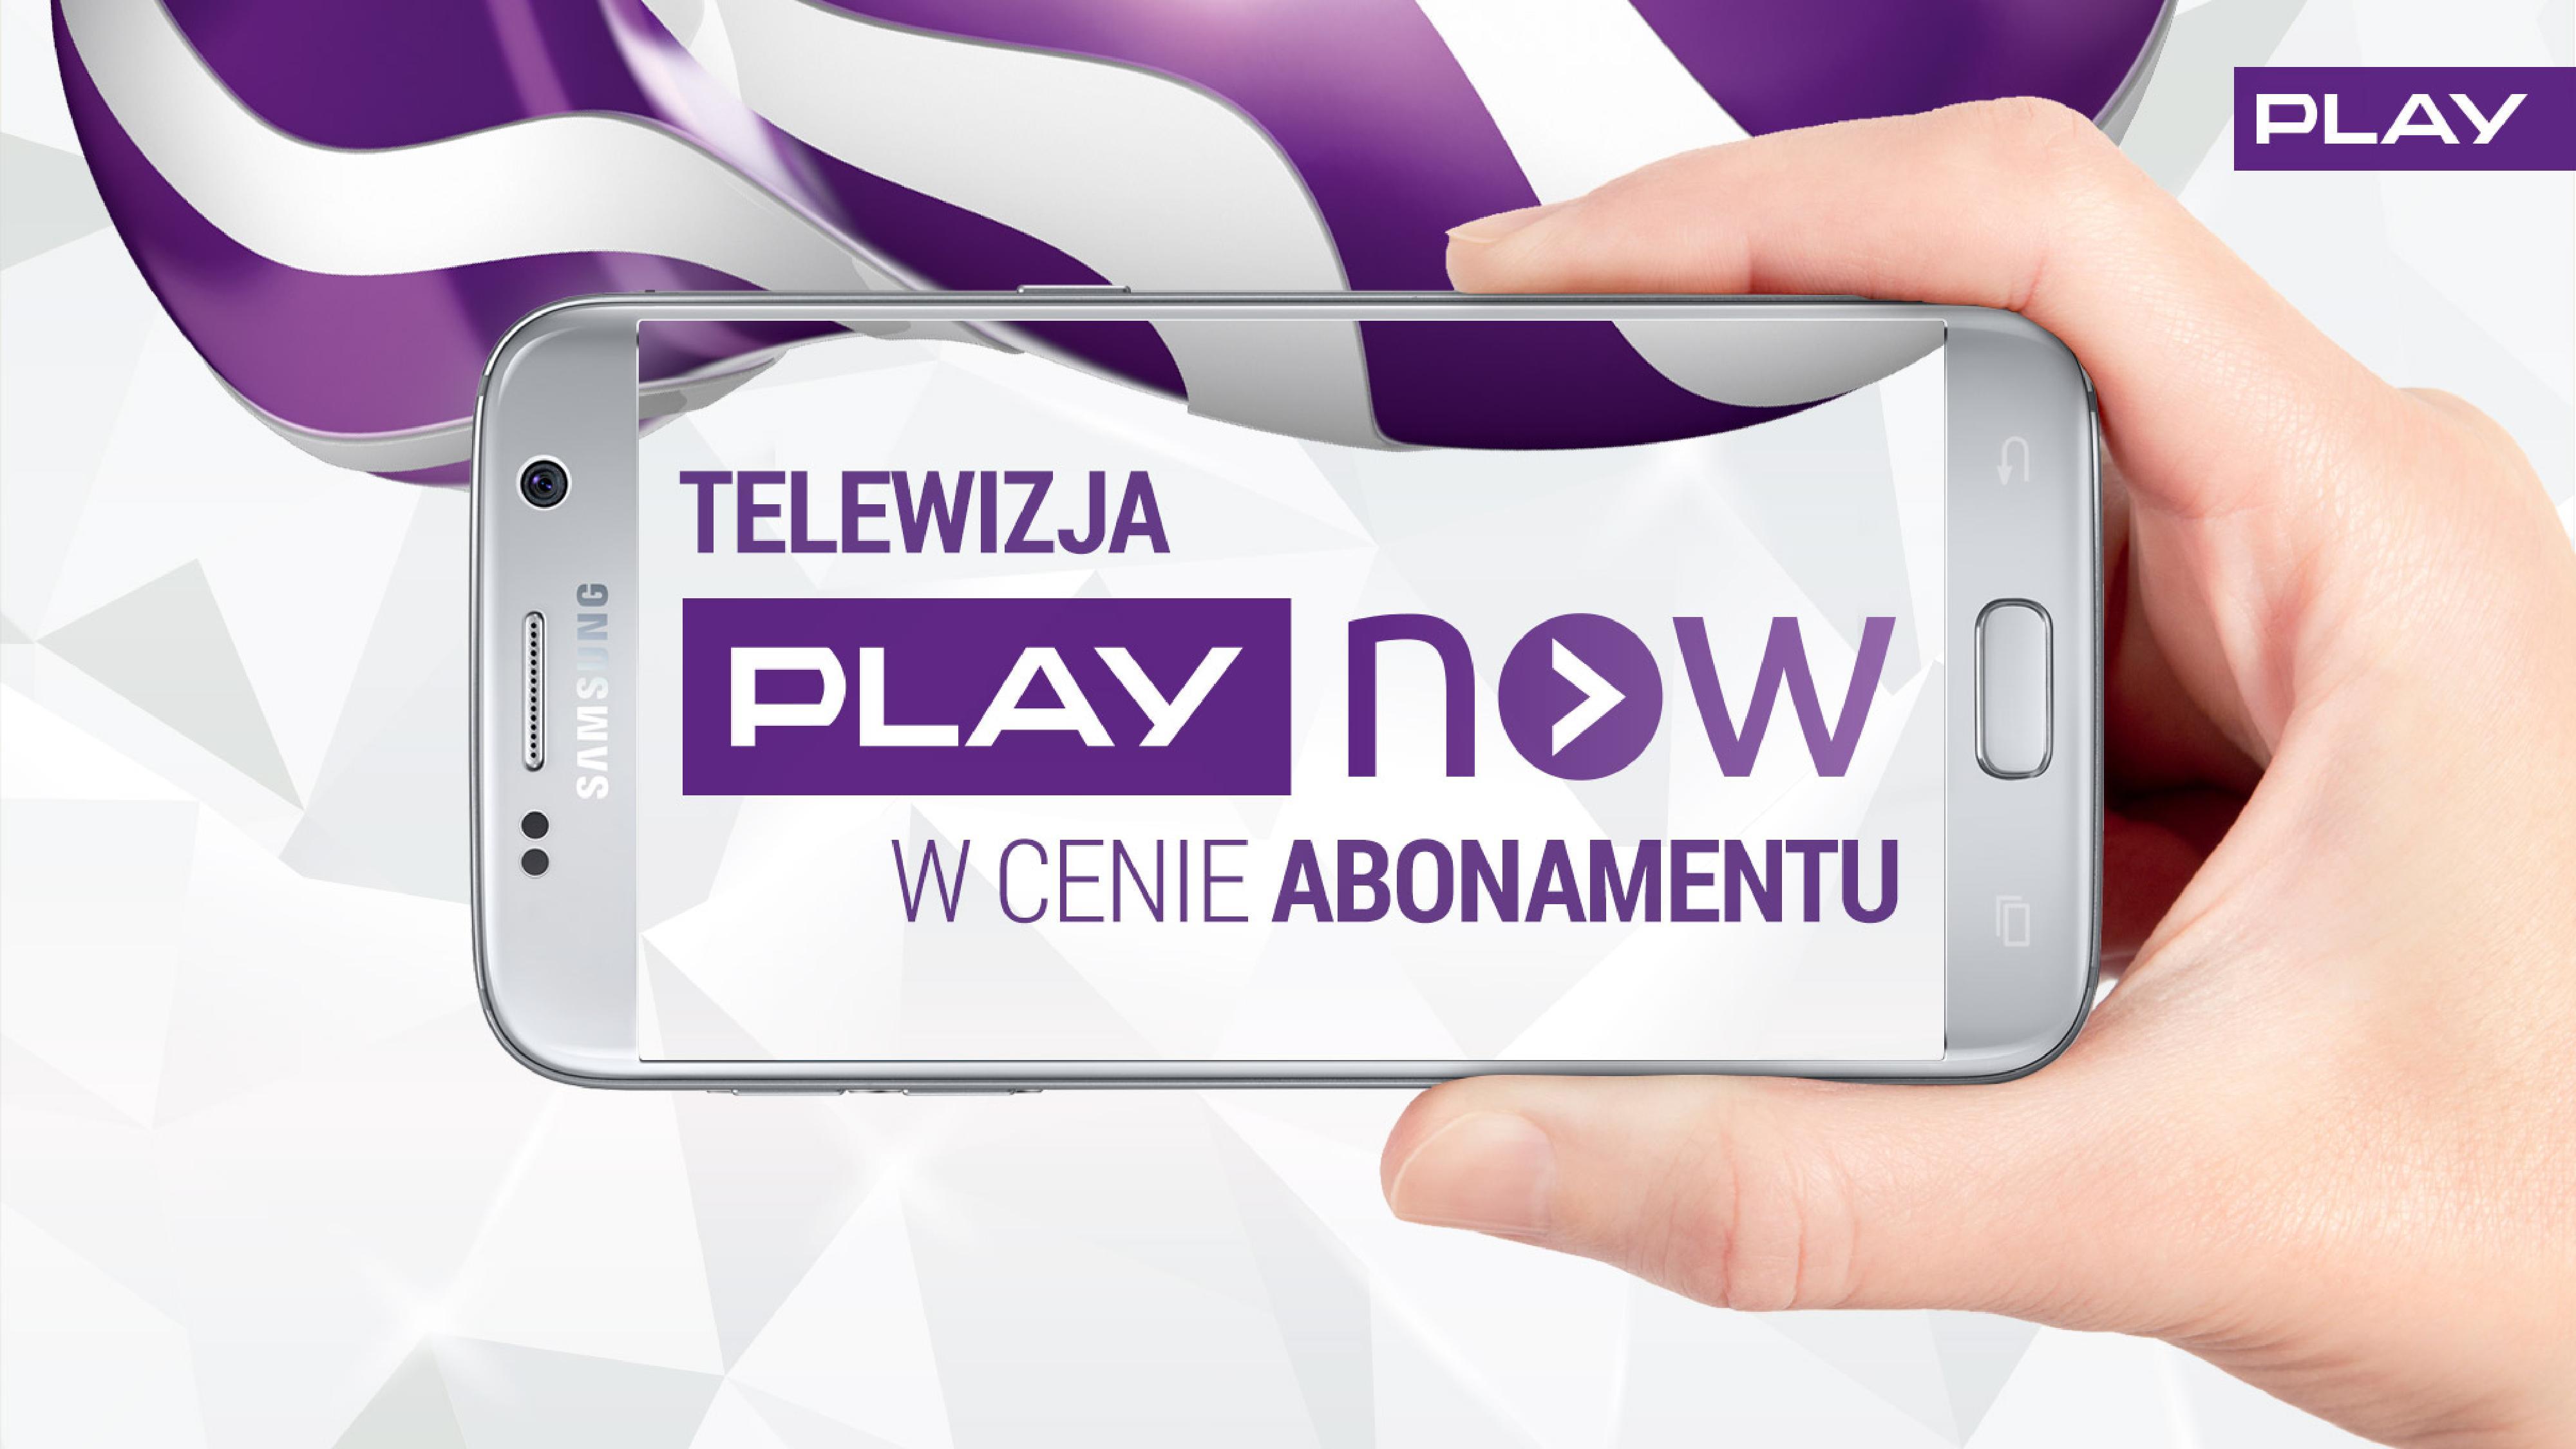 Play Now - telewizja Play